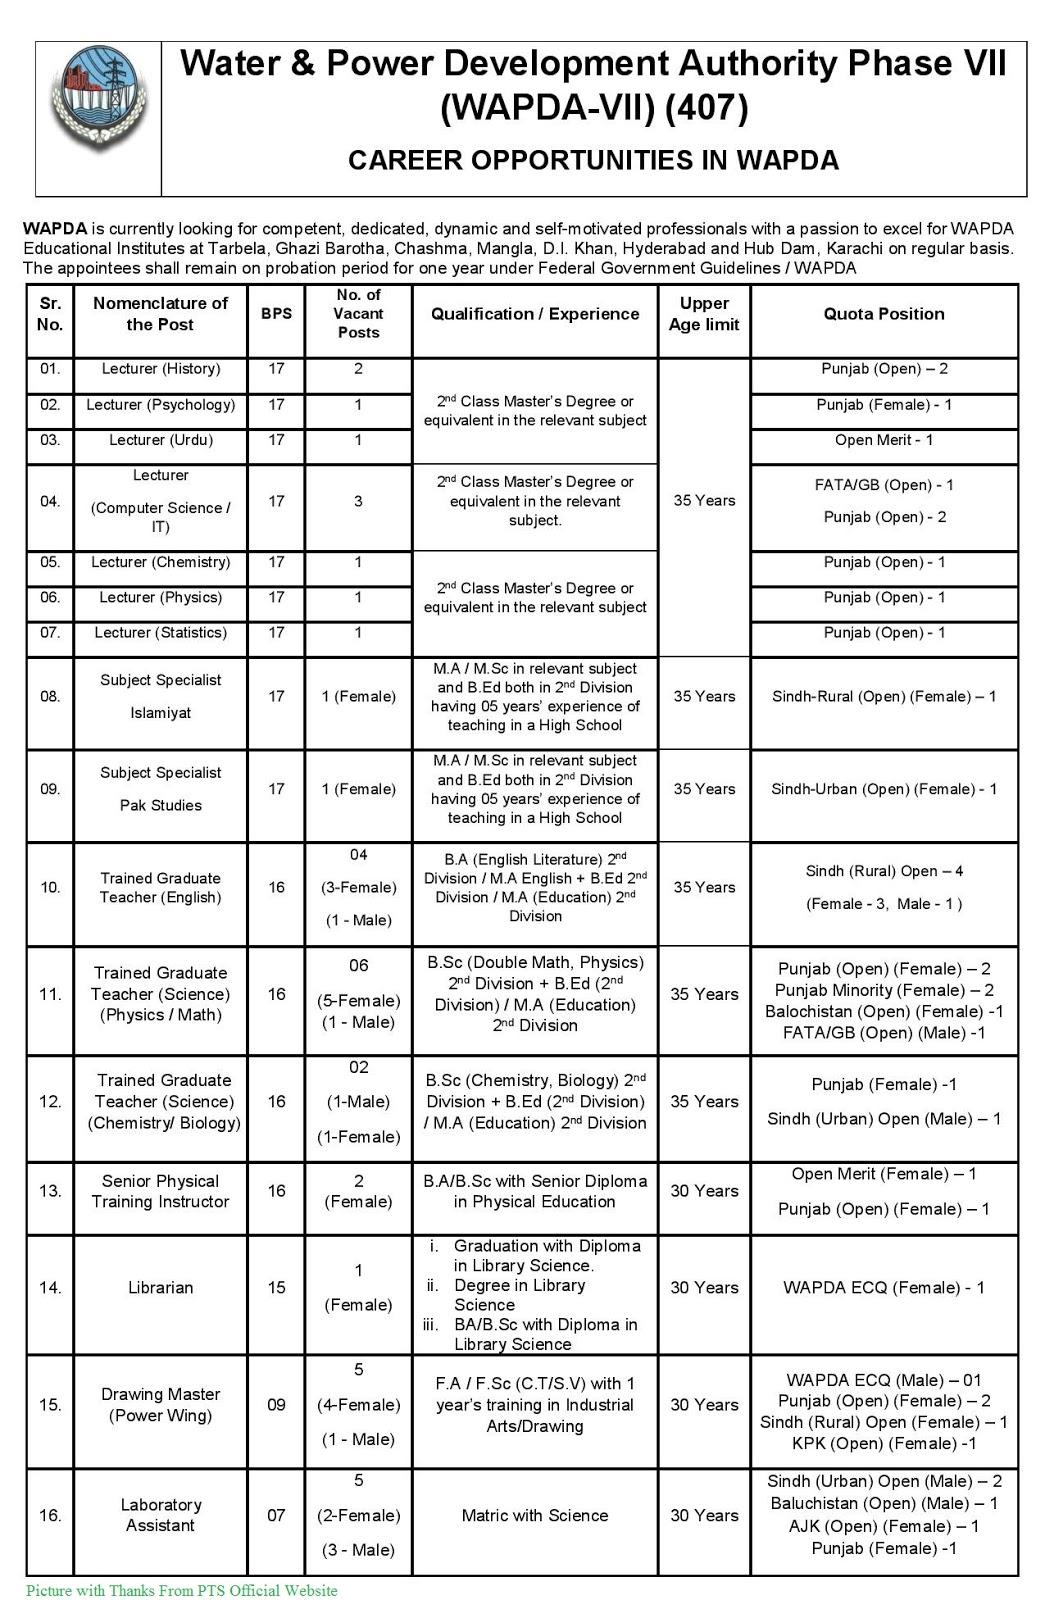 WAPDA Jobs 2020 - Latest Jobs in Wapda Lecturers, Subject Specialists, Graduate Teachers, Laboratory Assistants